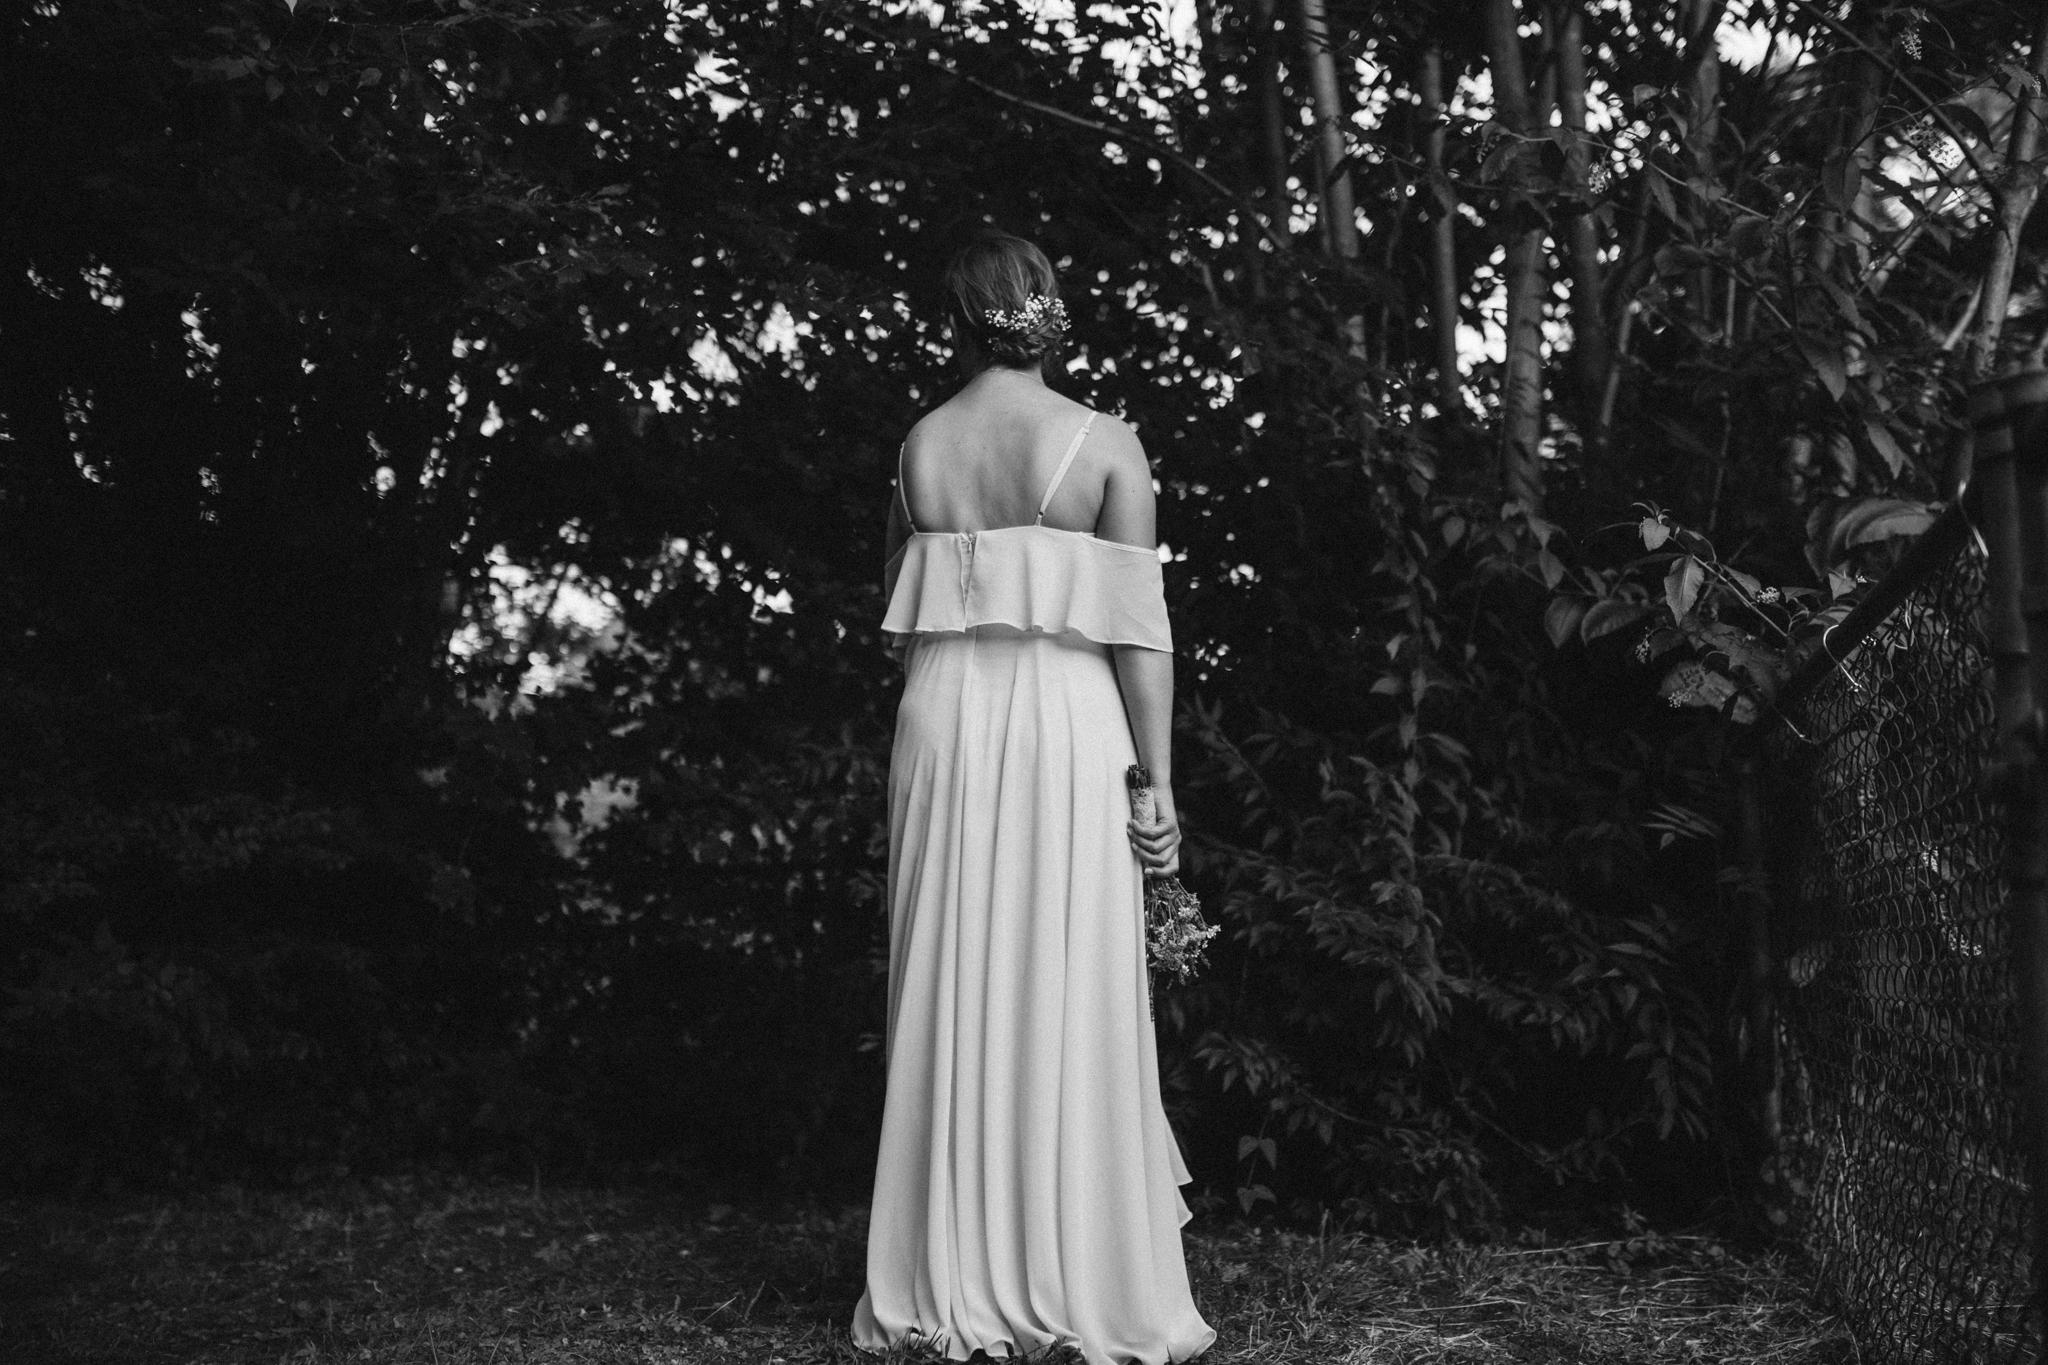 dorota_dwight_richmond_backyard_wedding-61.jpg